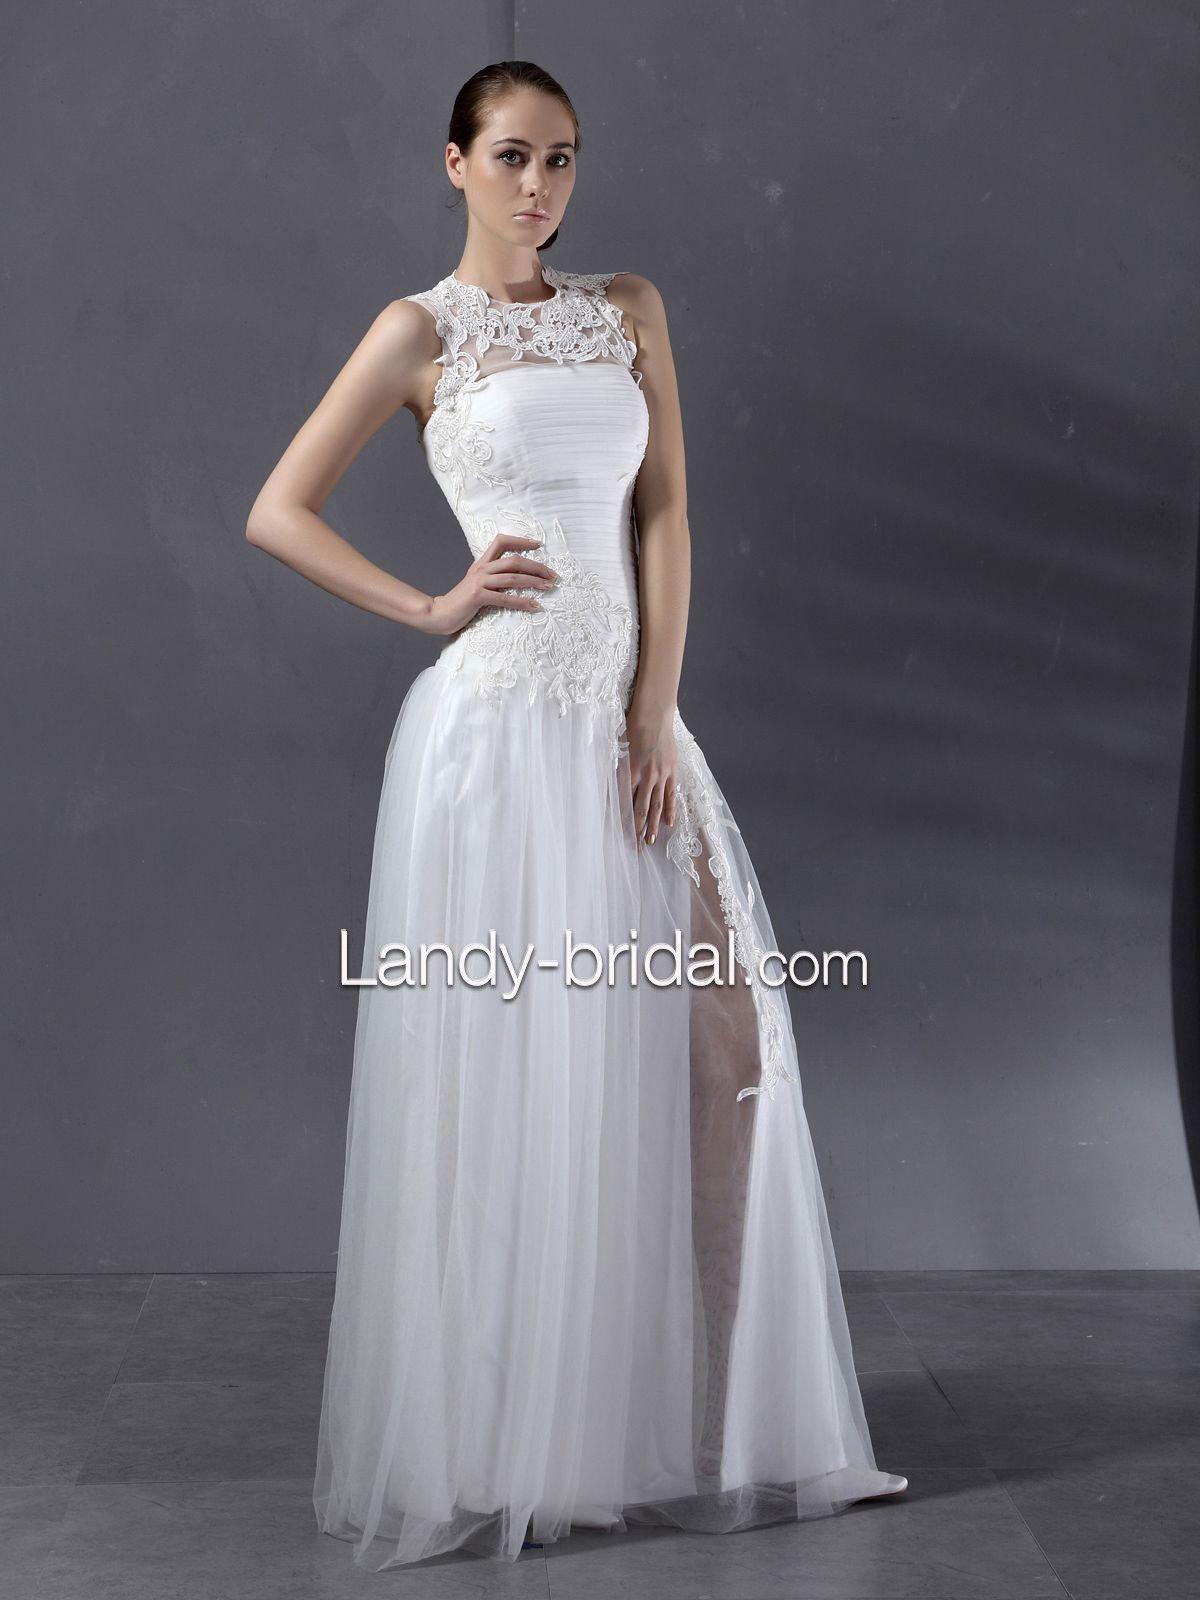 55+ Tank top Style Wedding Dress - Women\'s Dresses for Wedding Guest ...